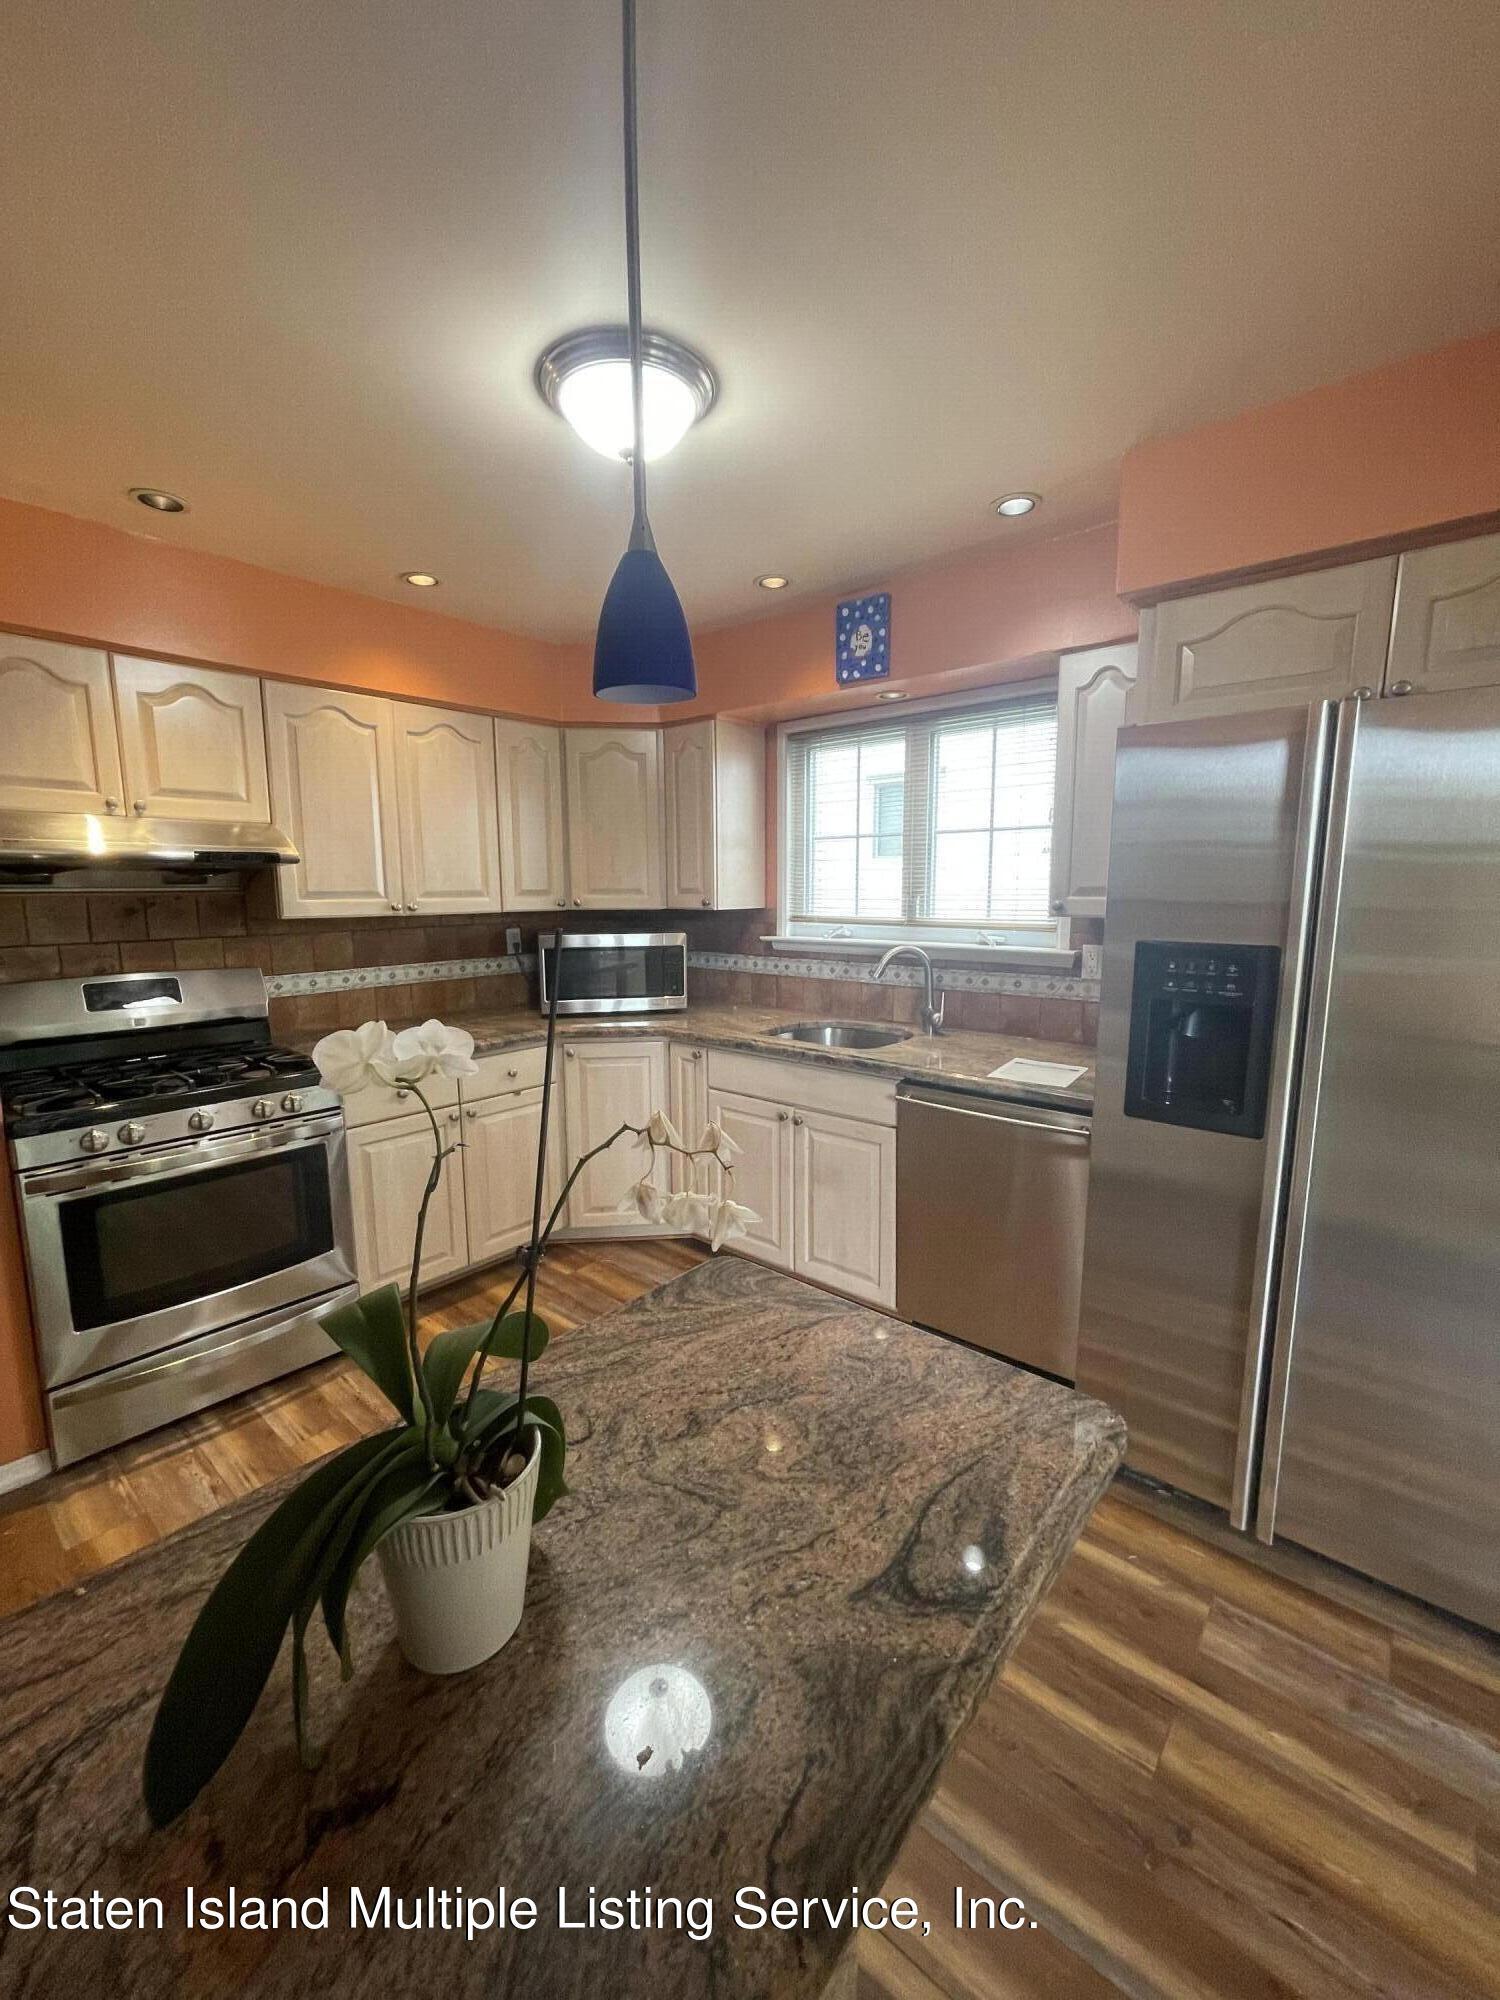 Single Family - Detached 484 Mountainview Avenue  Staten Island, NY 10314, MLS-1147175-4